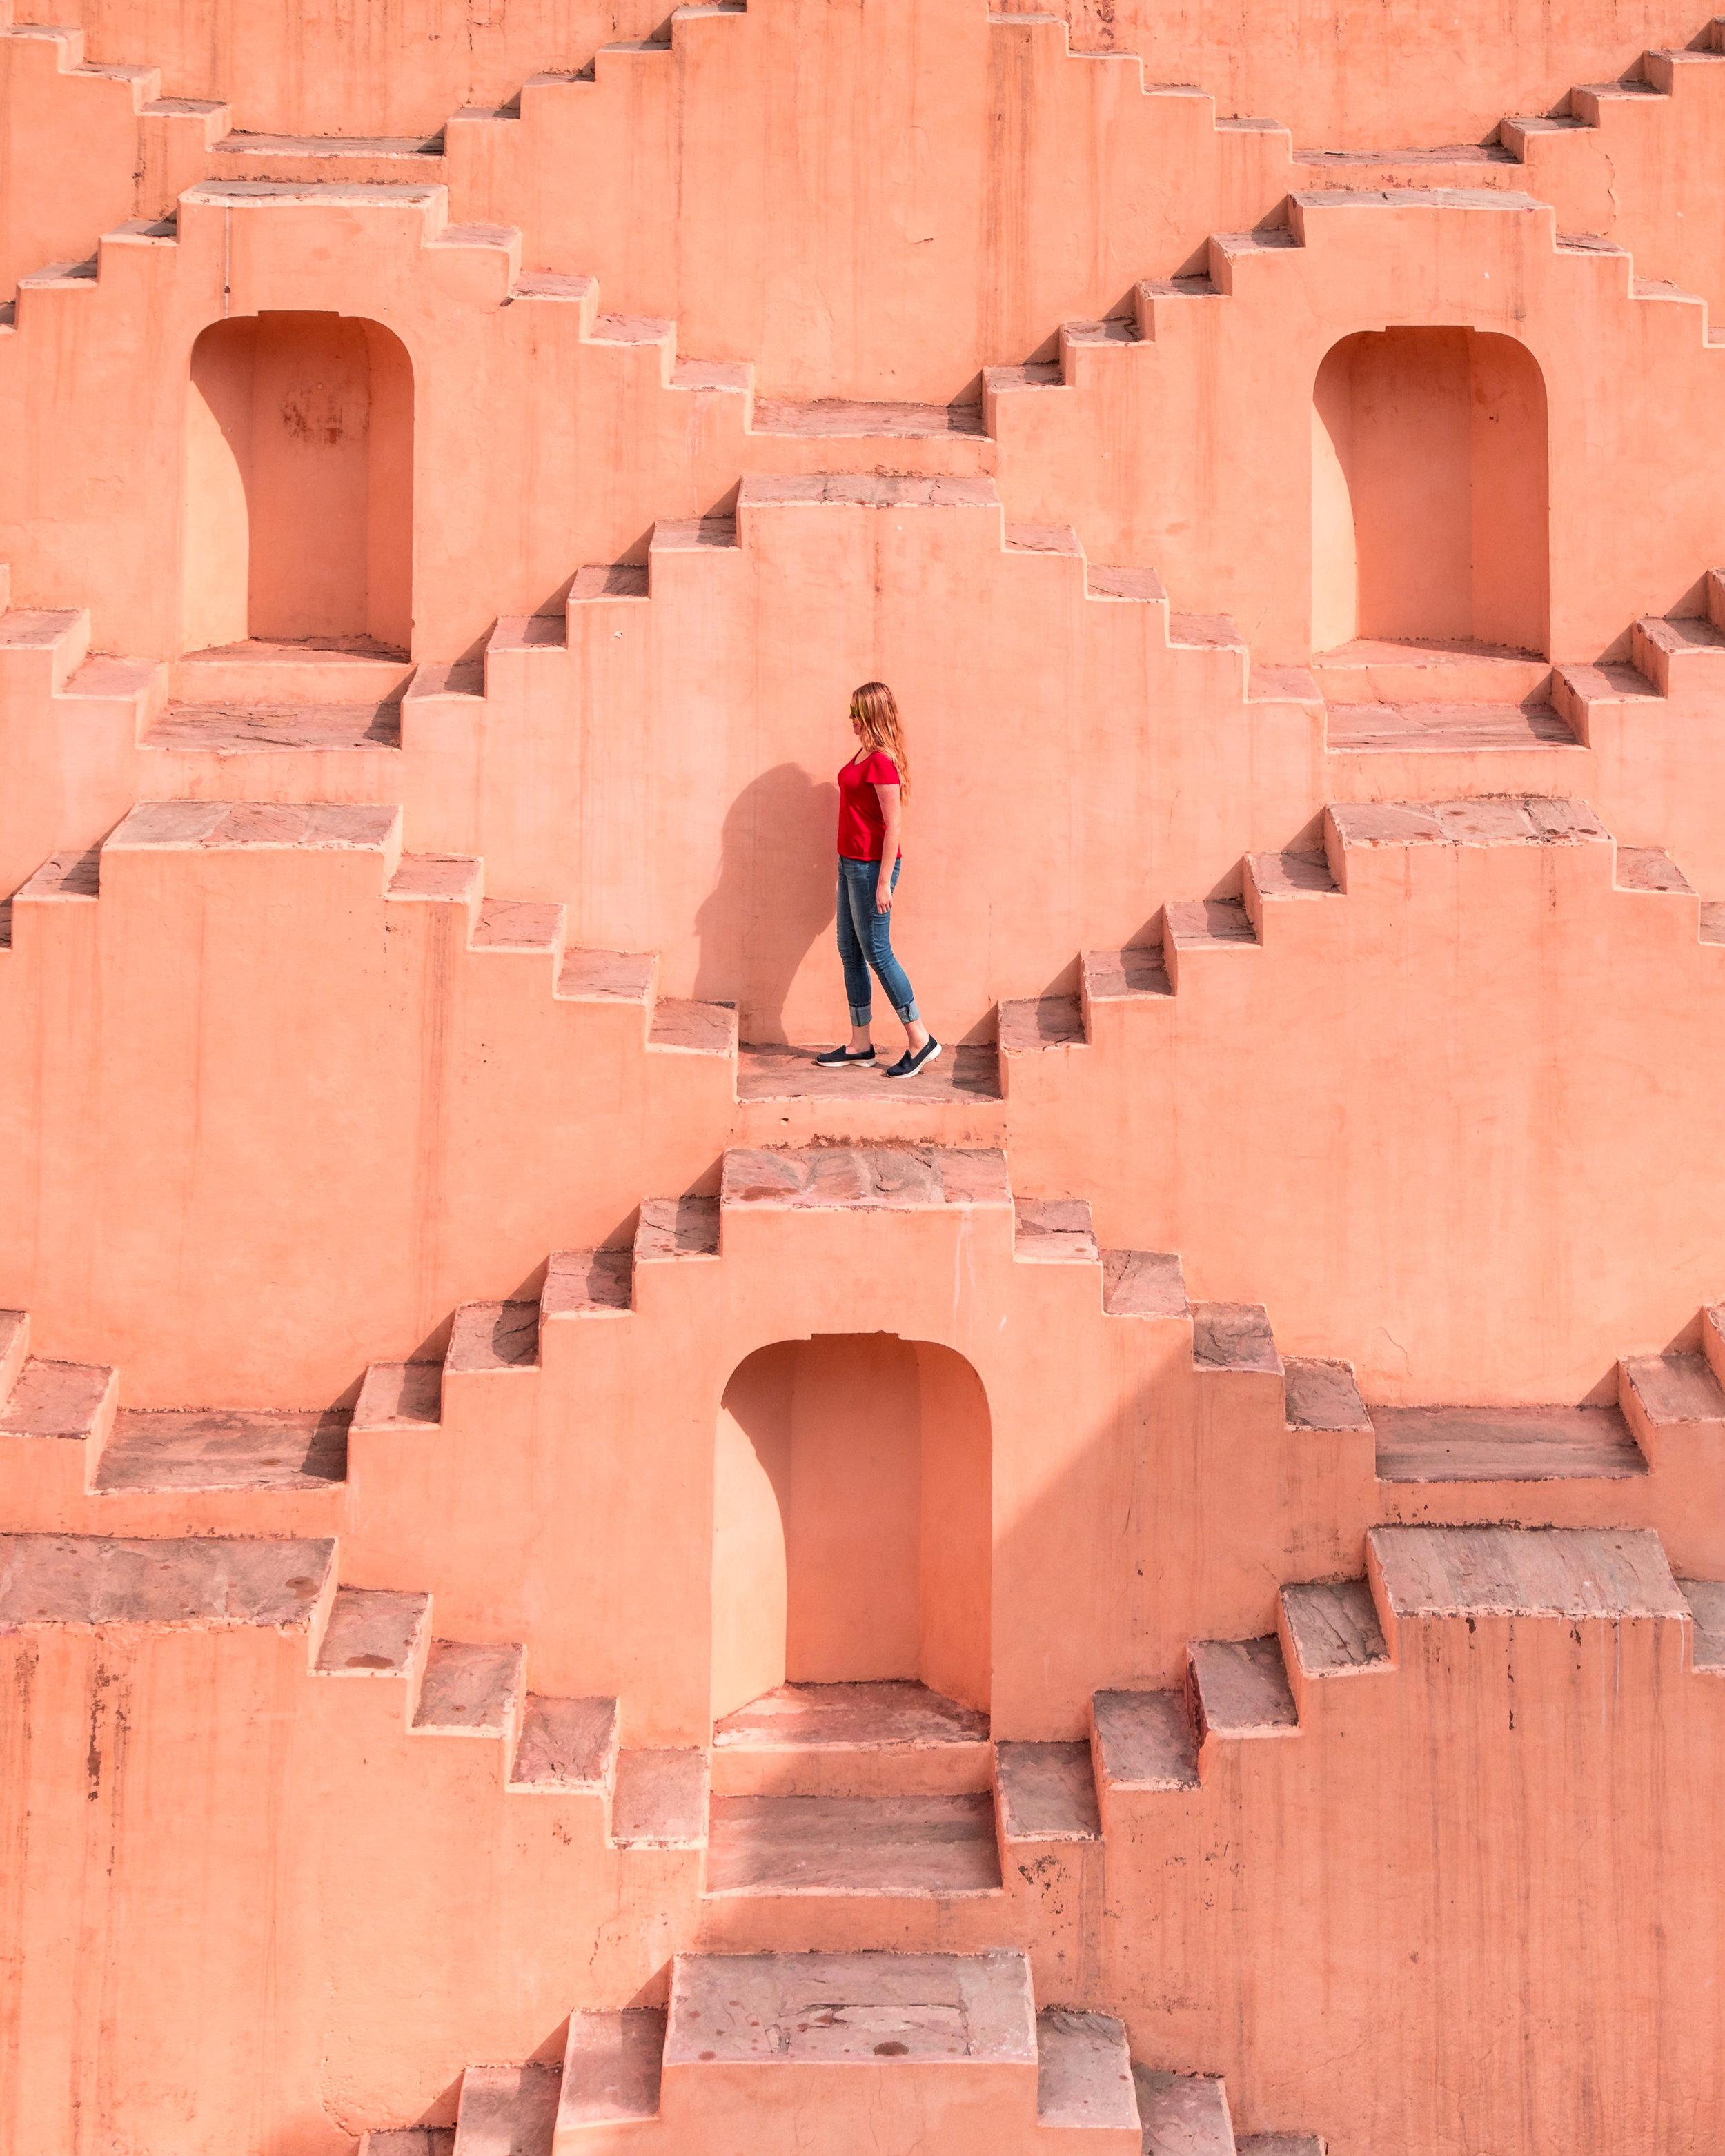 Places to visit in Jaipur - Panna Meena Ka Kund